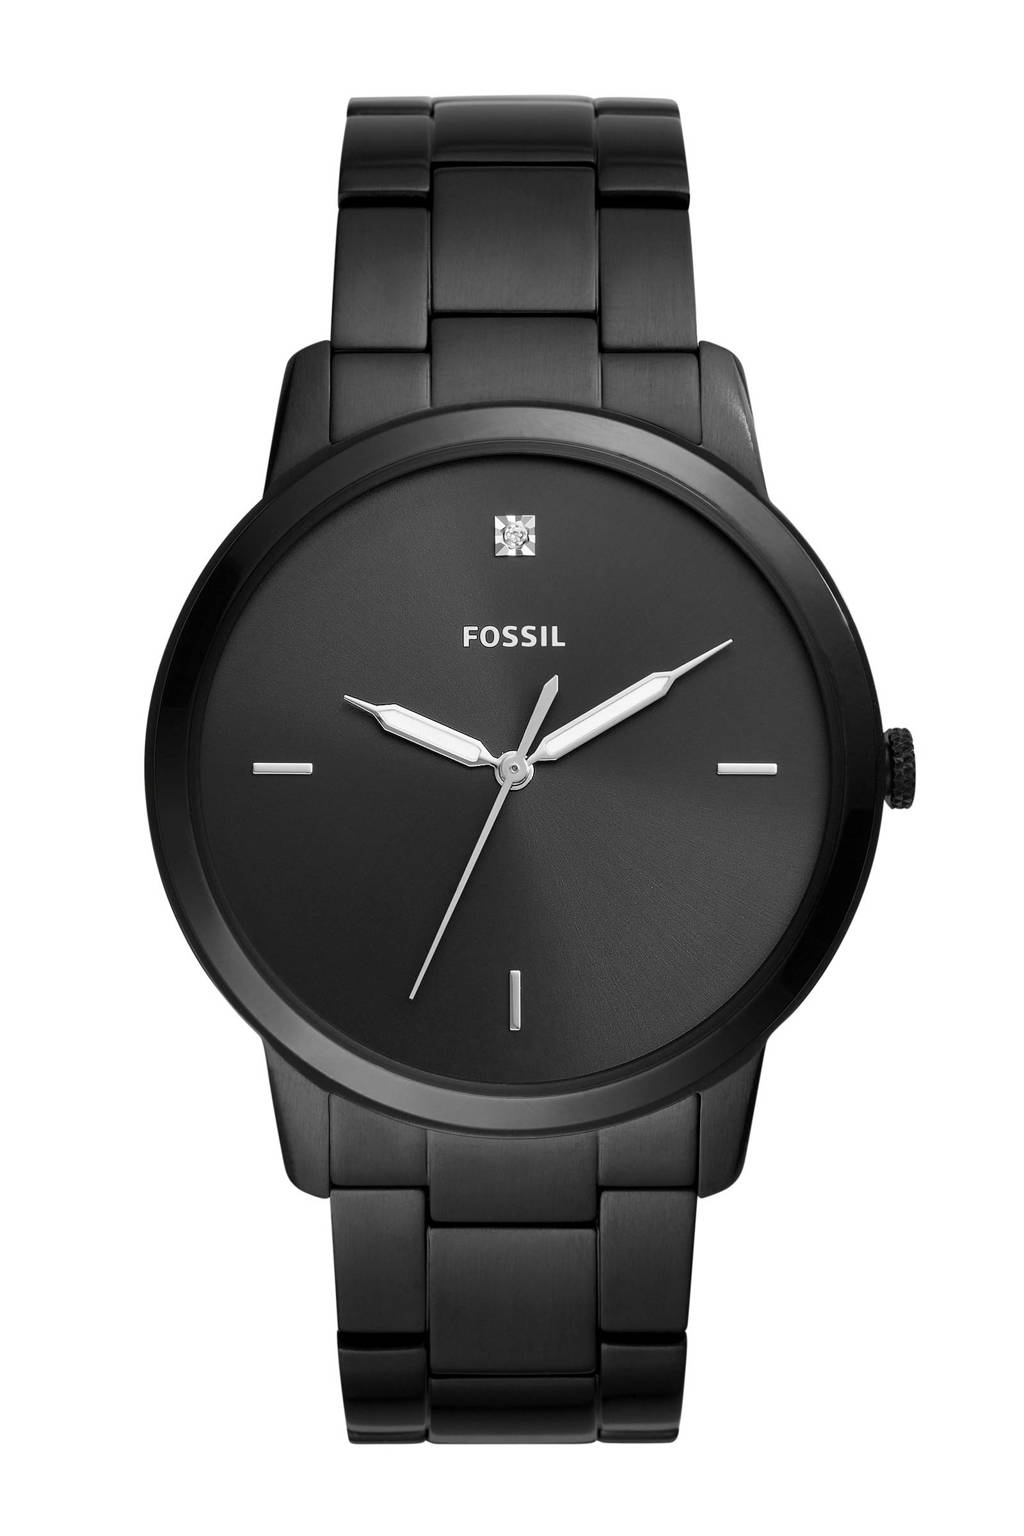 Fossil horloge The Minimalist FS5455, Zwart